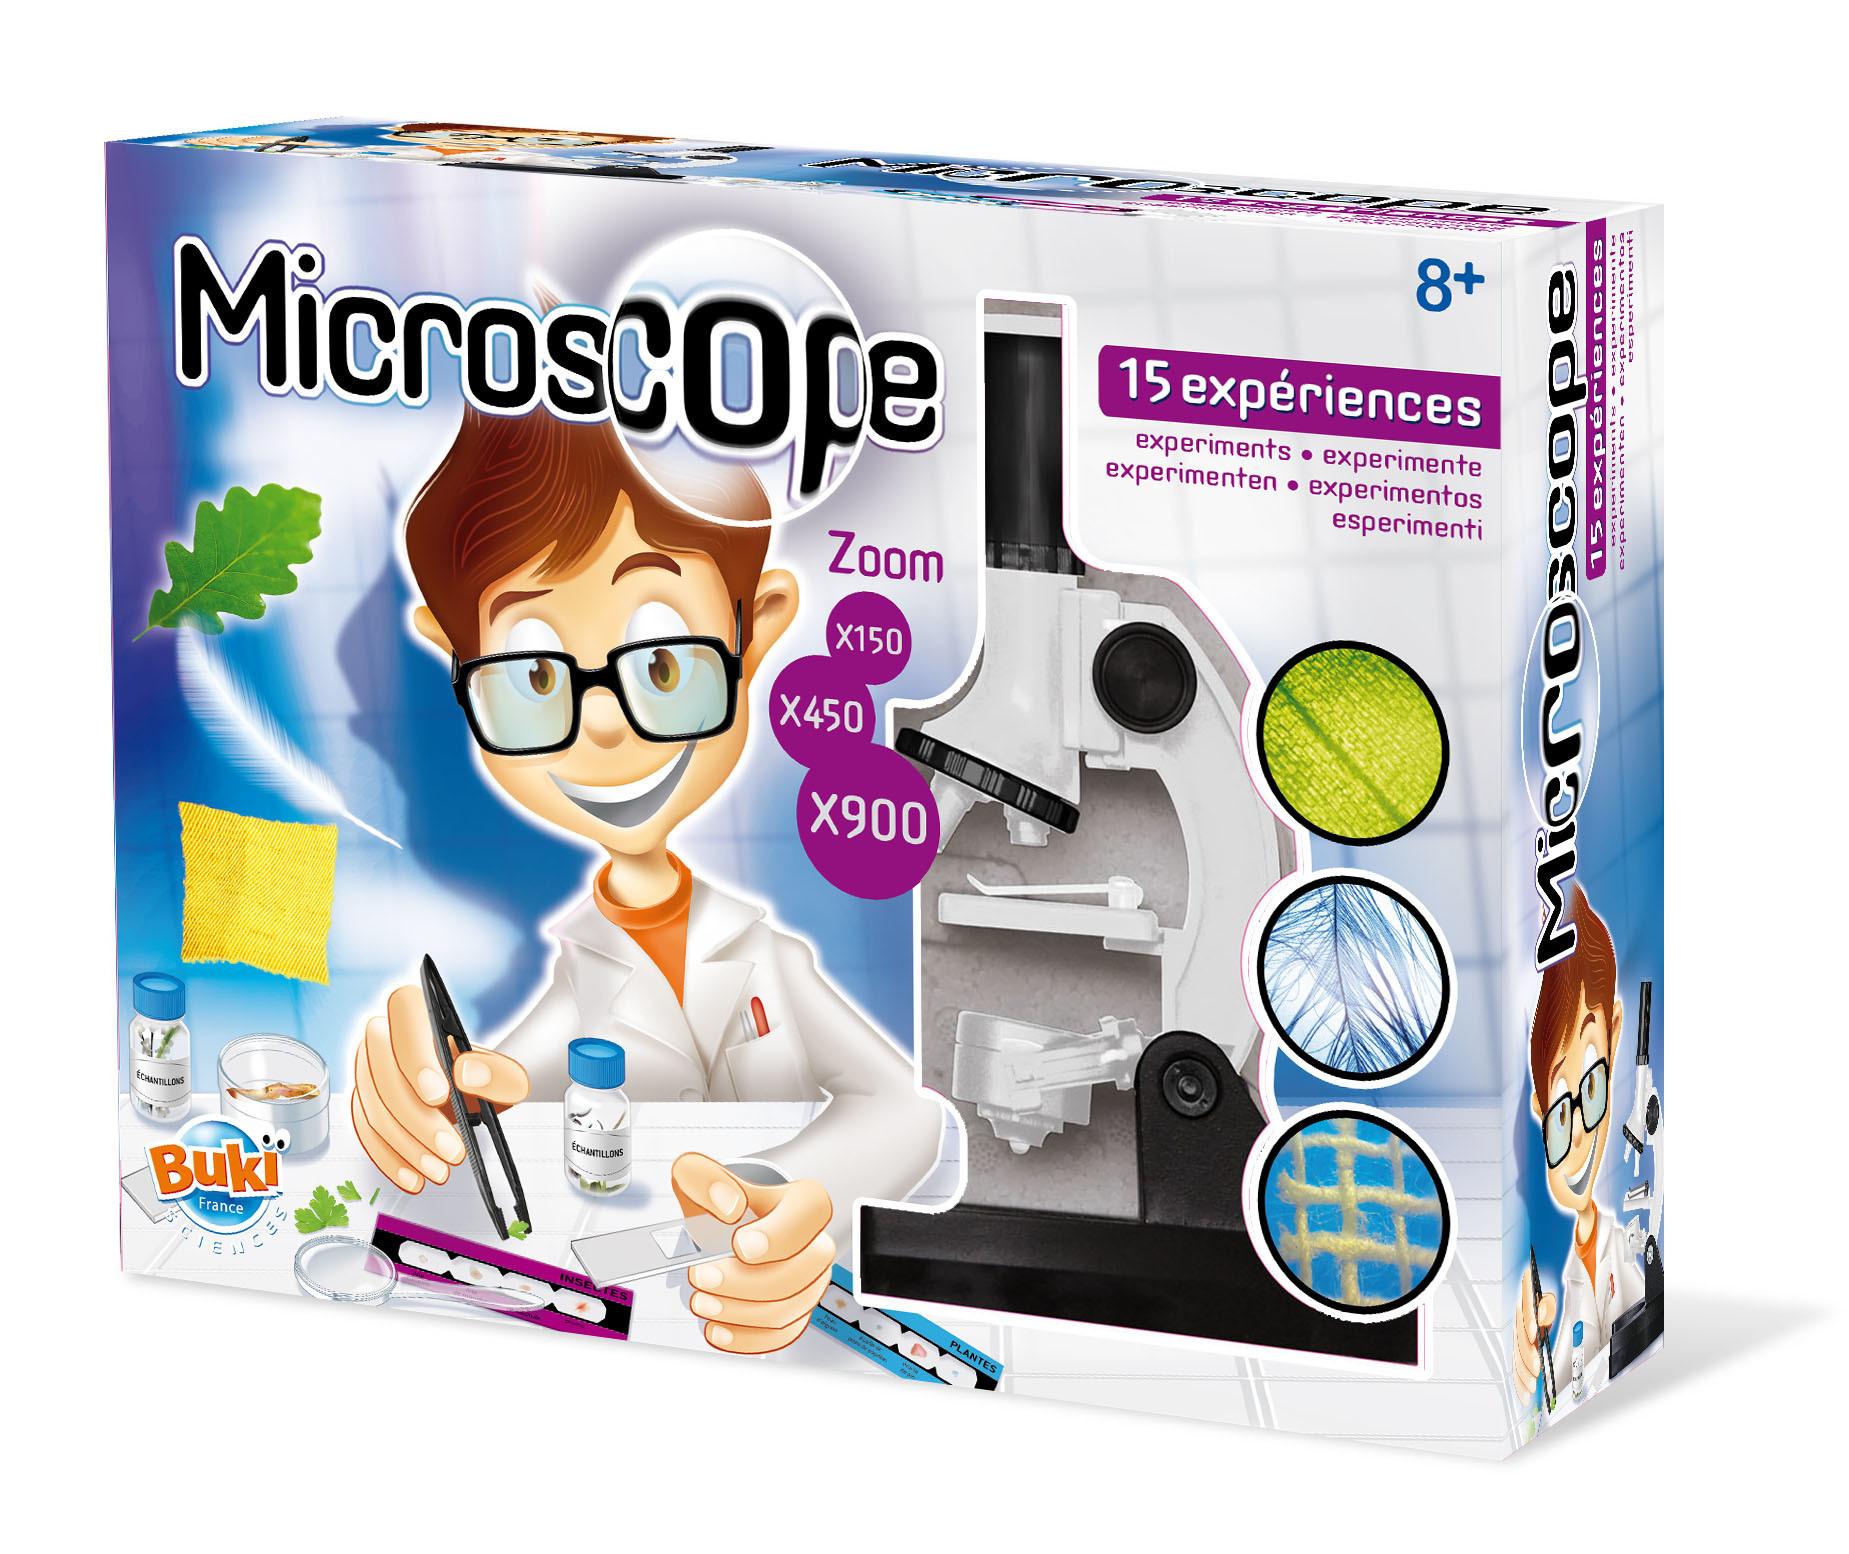 Microscope x900 - Buki